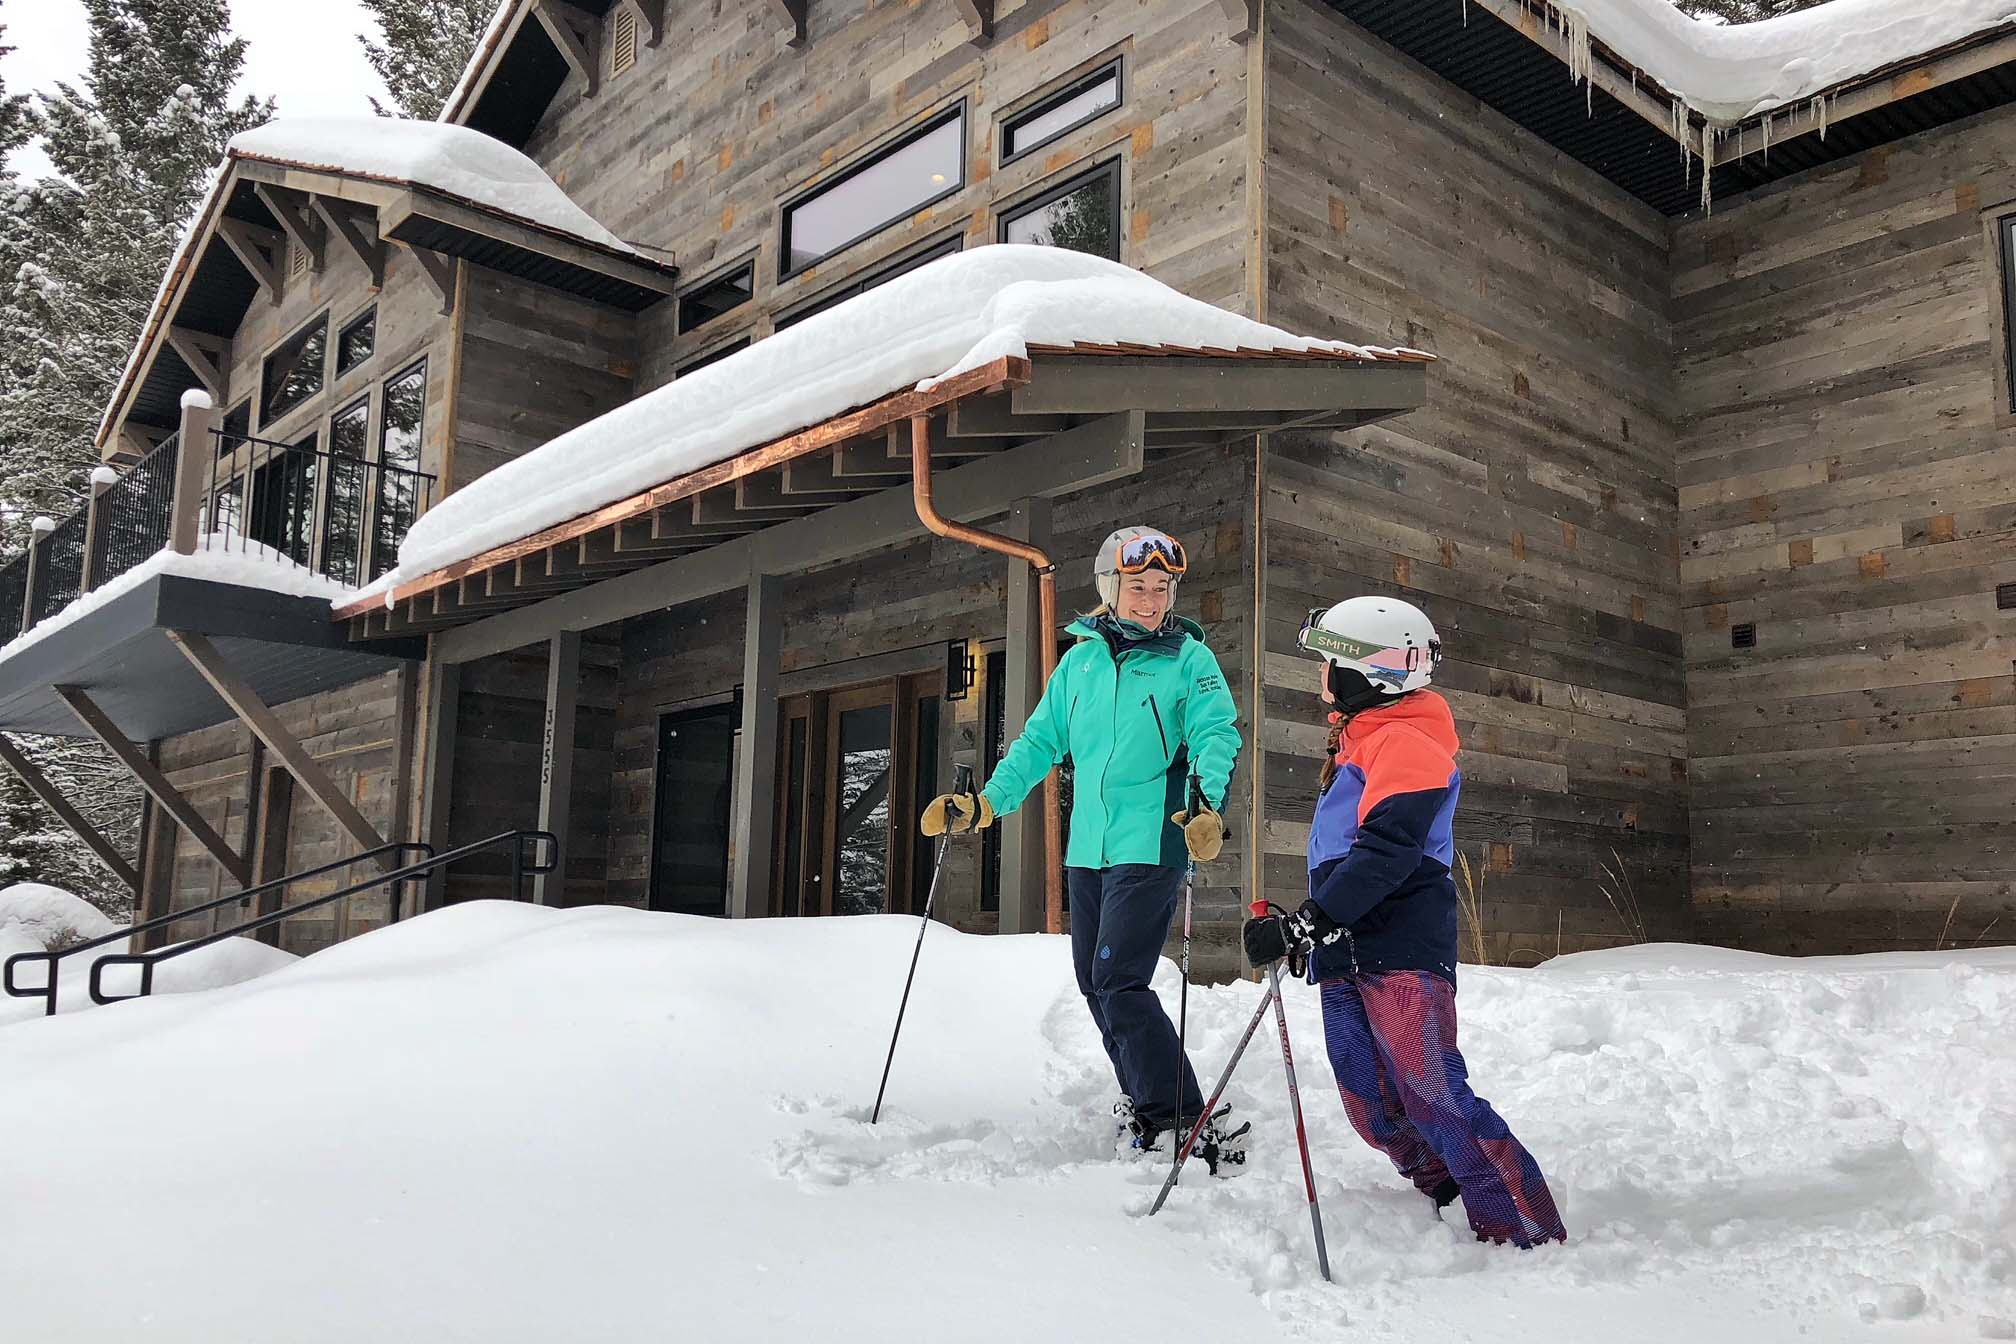 Ski In Ski Out Teton Village Real Estate - Stag's Leap